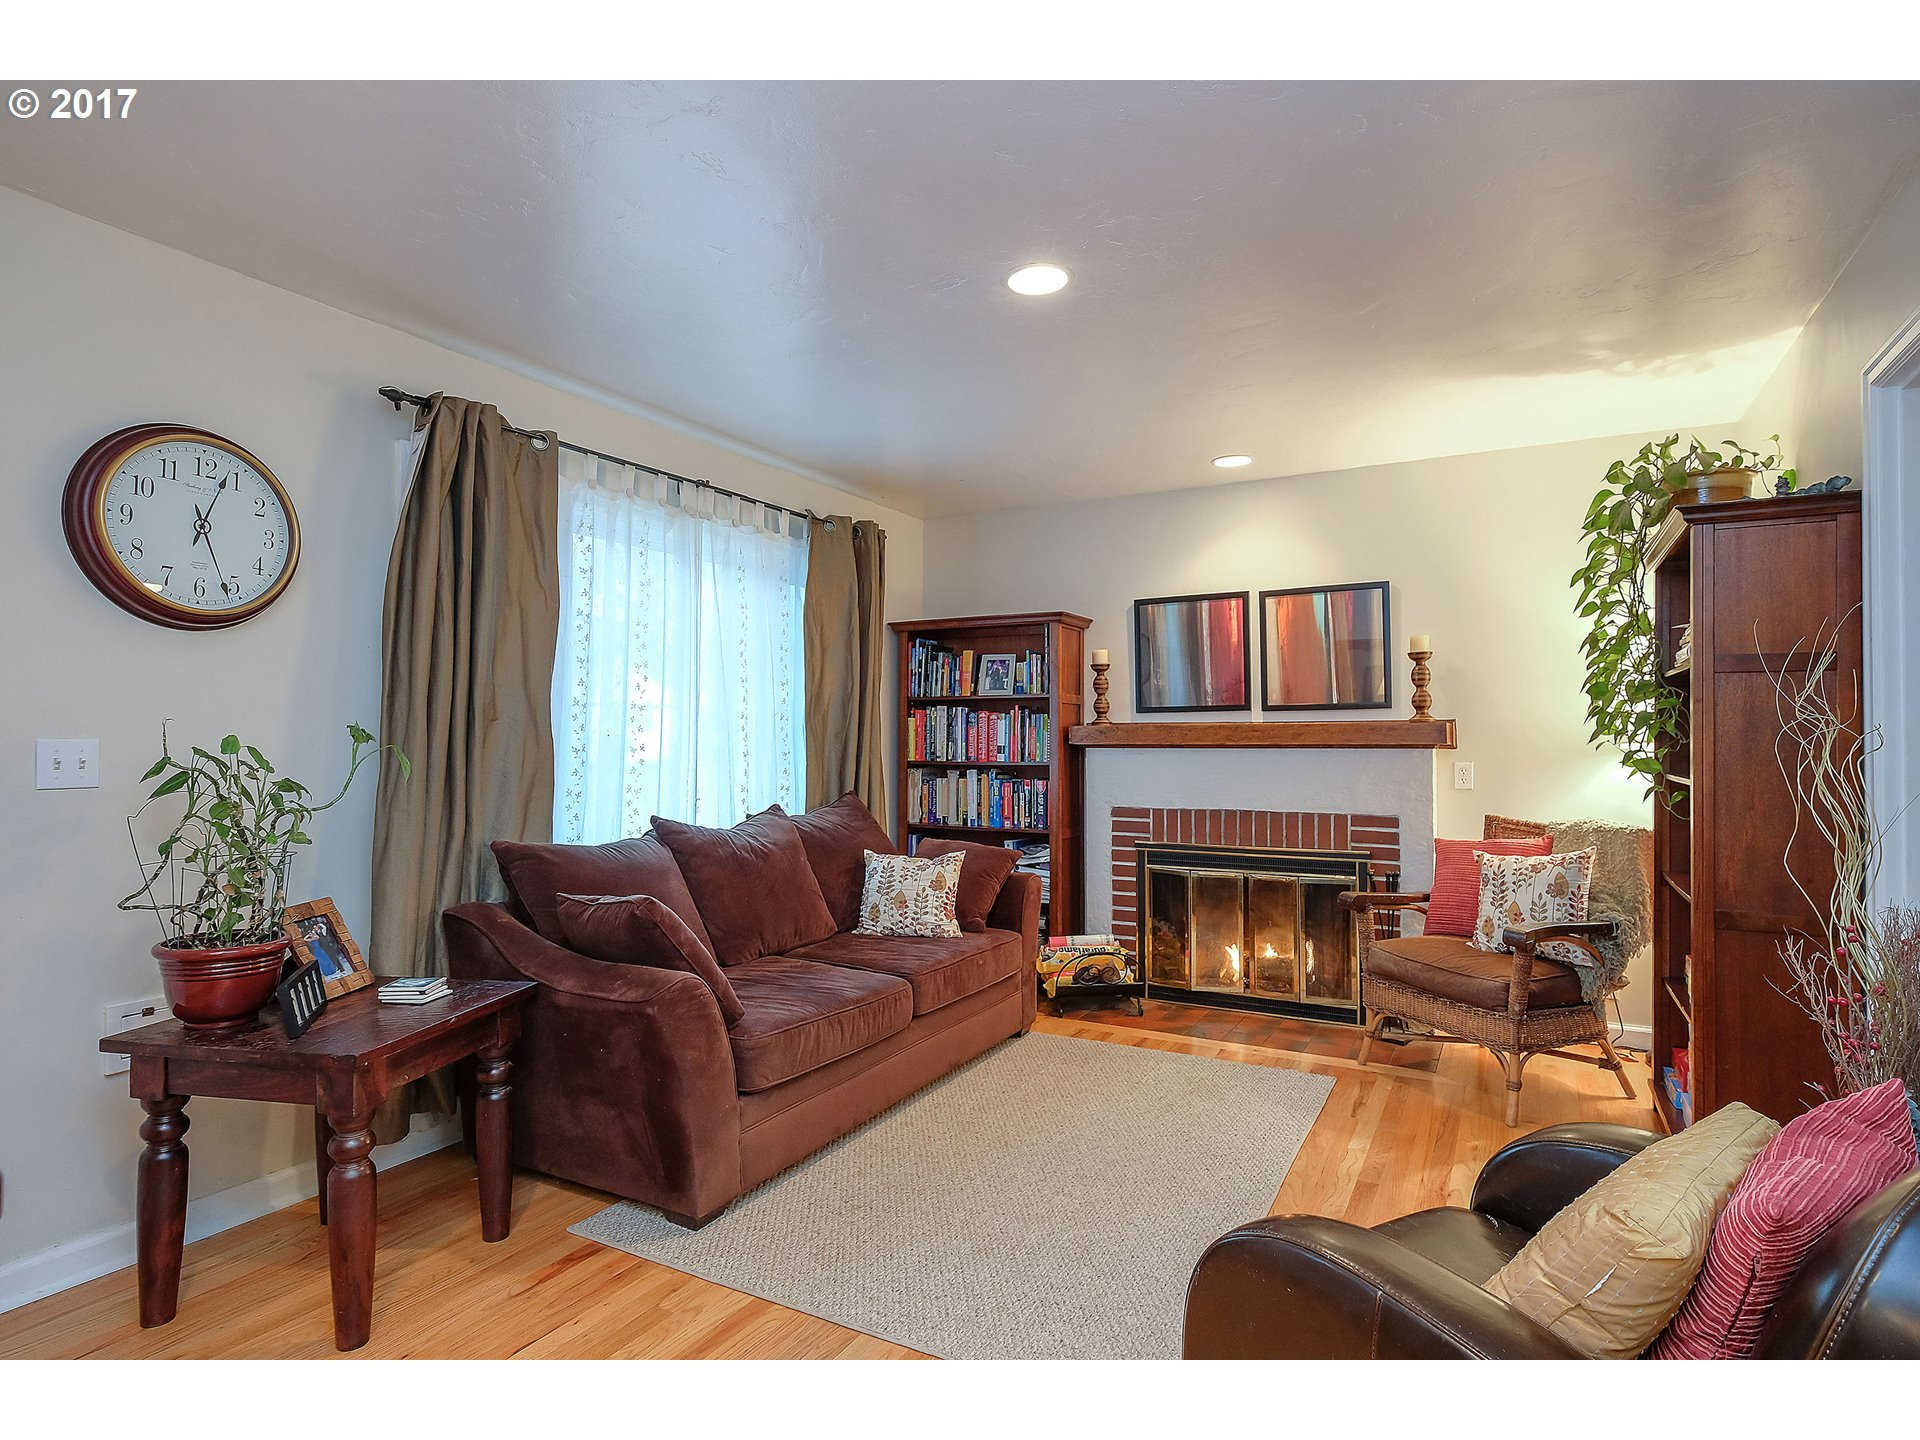 11725 SW 12TH ST Beaverton, OR 97005 - MLS #: 17339225